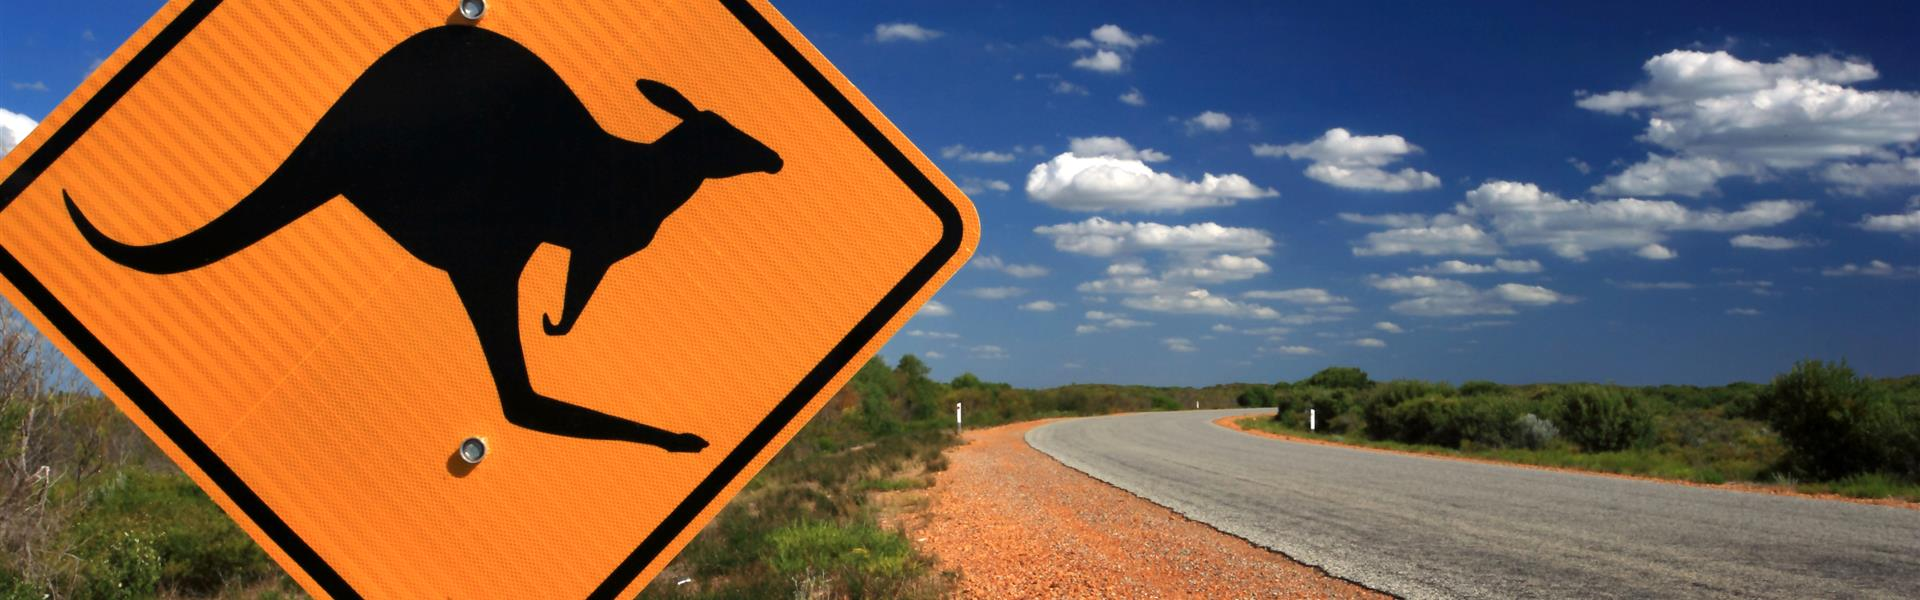 Austrálie -